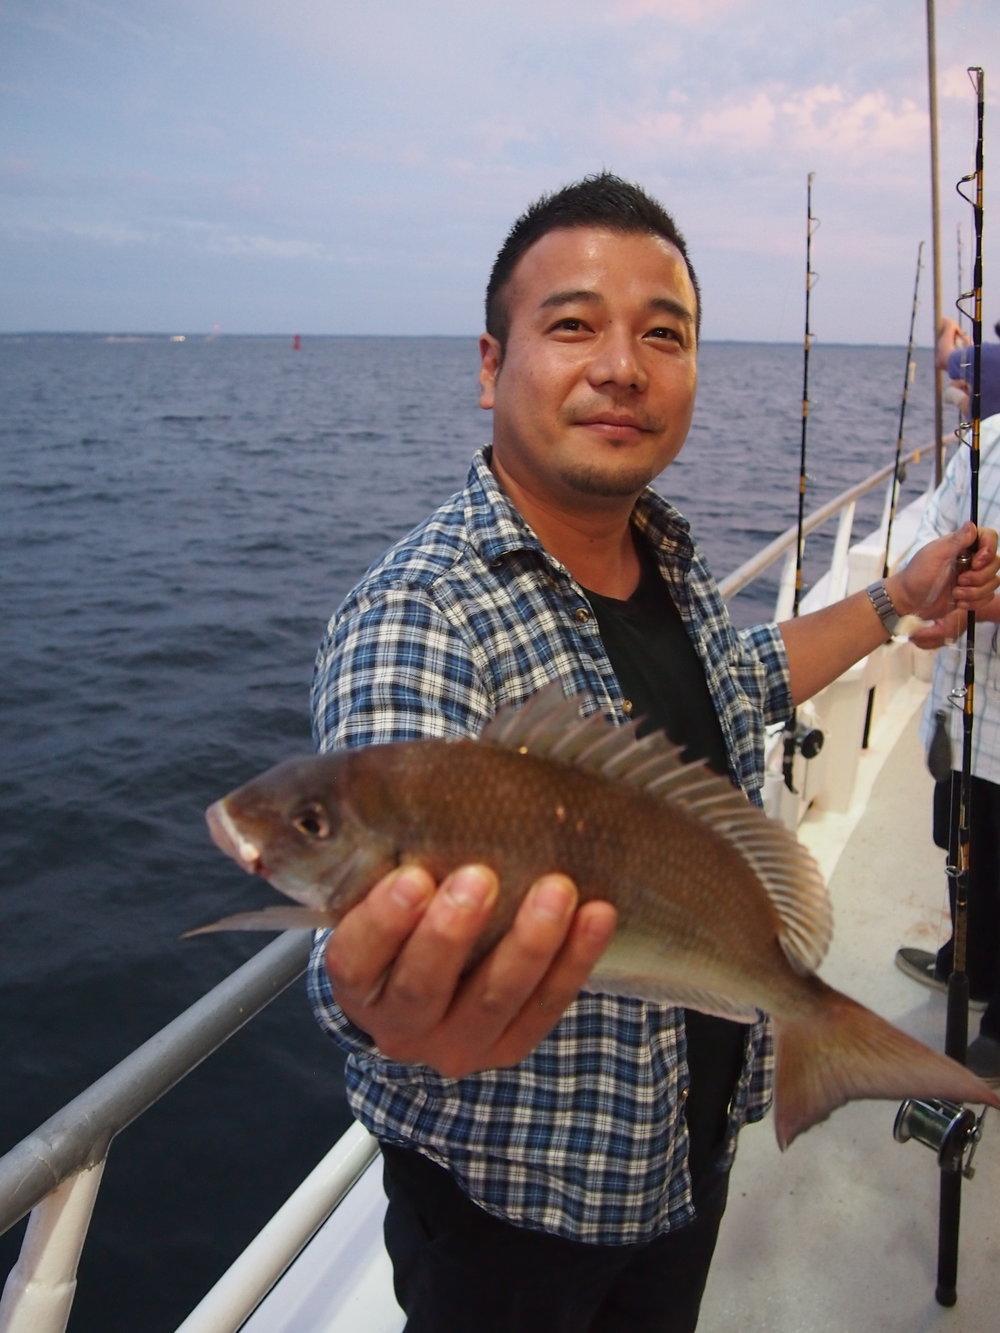 chef akiyama young street poke